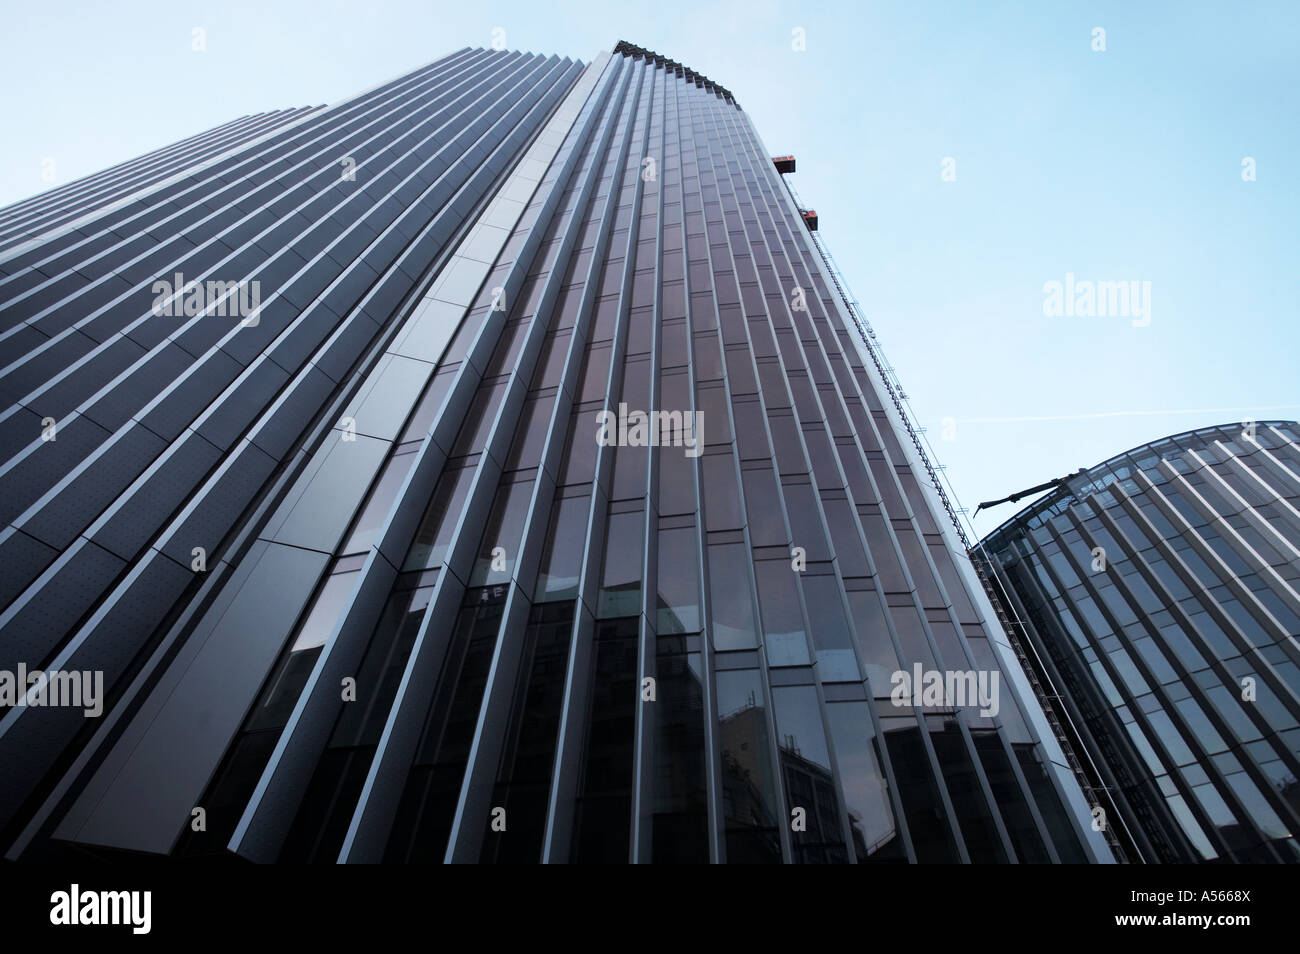 51 Lime St street Willis Building in London UK - Stock Image